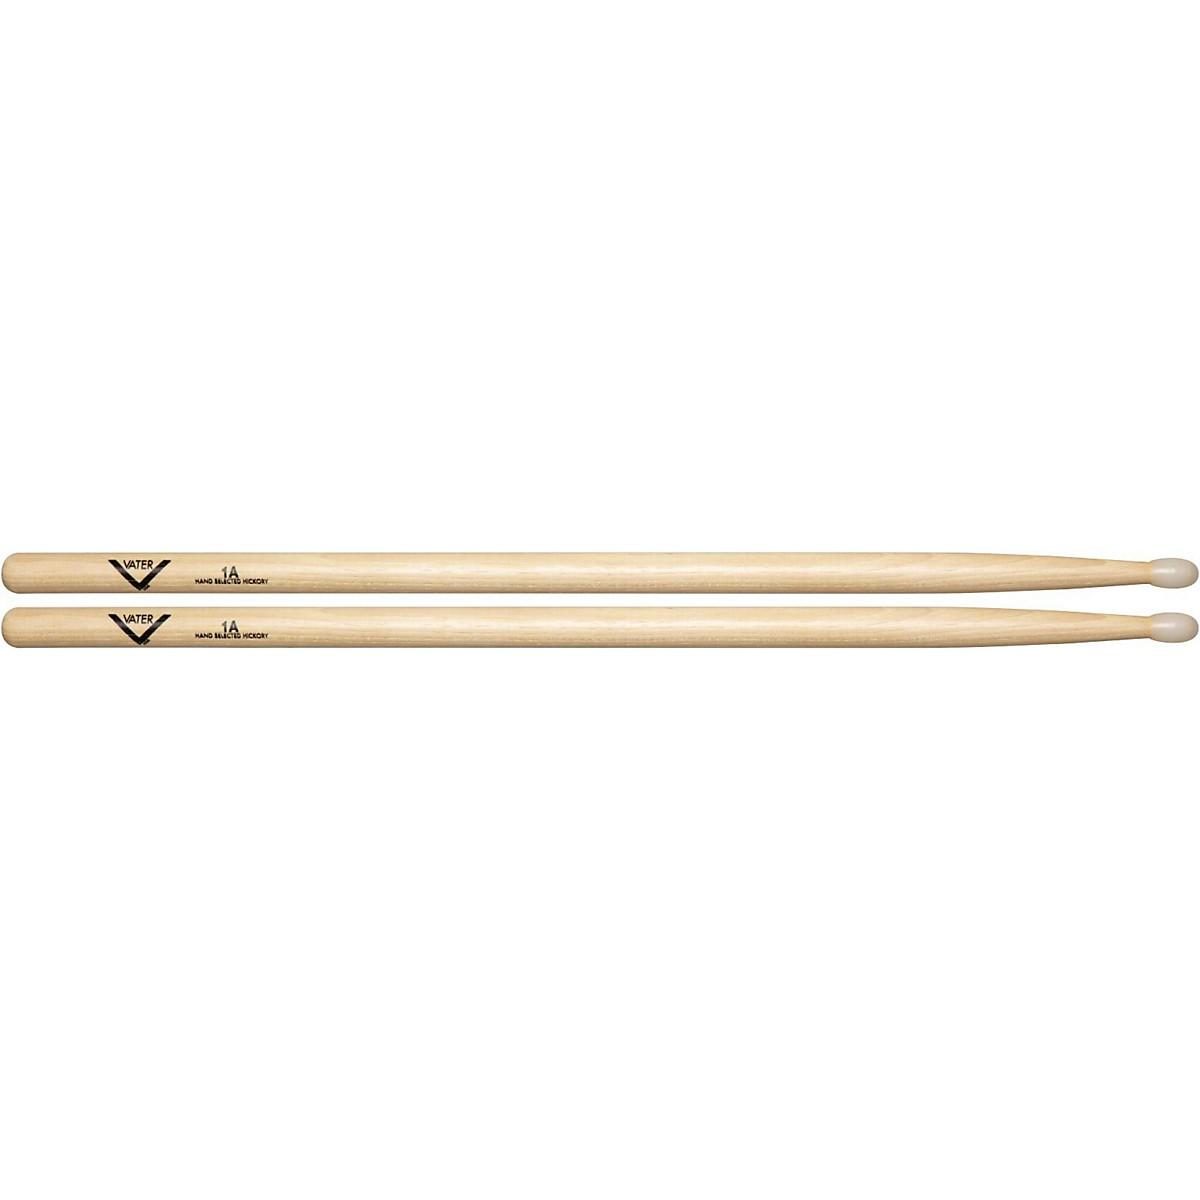 Vater American Hickory 1A Drum Sticks